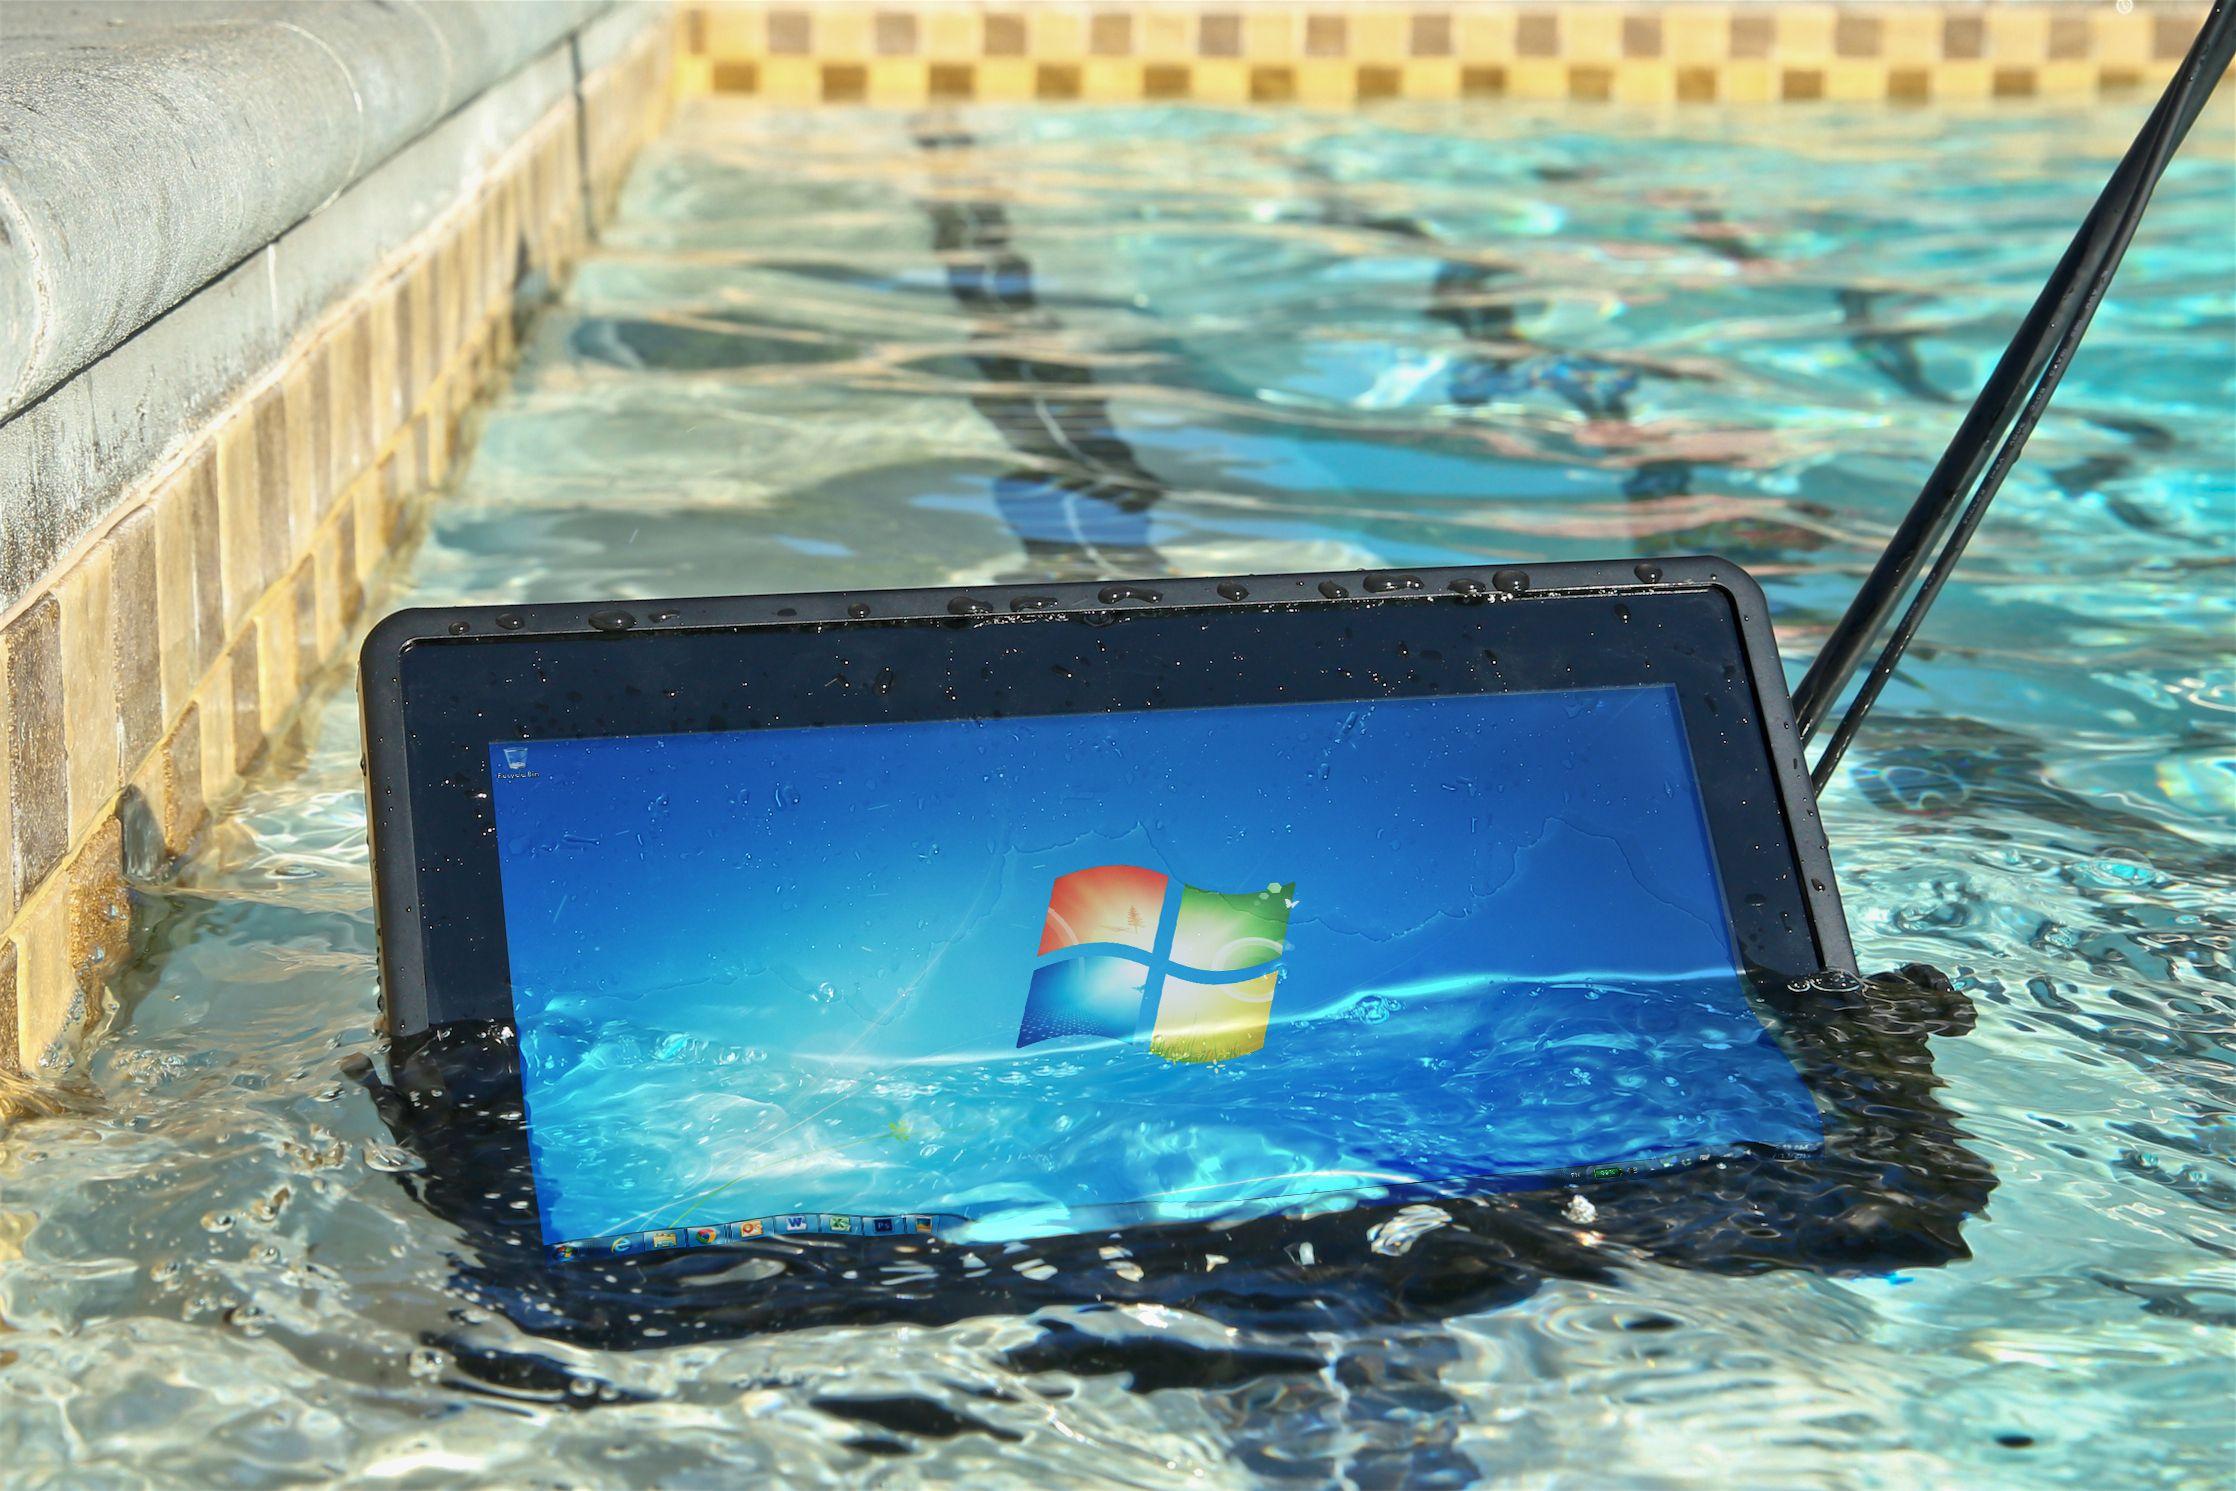 Xenarc Technologies manufactures the best marine waterproof